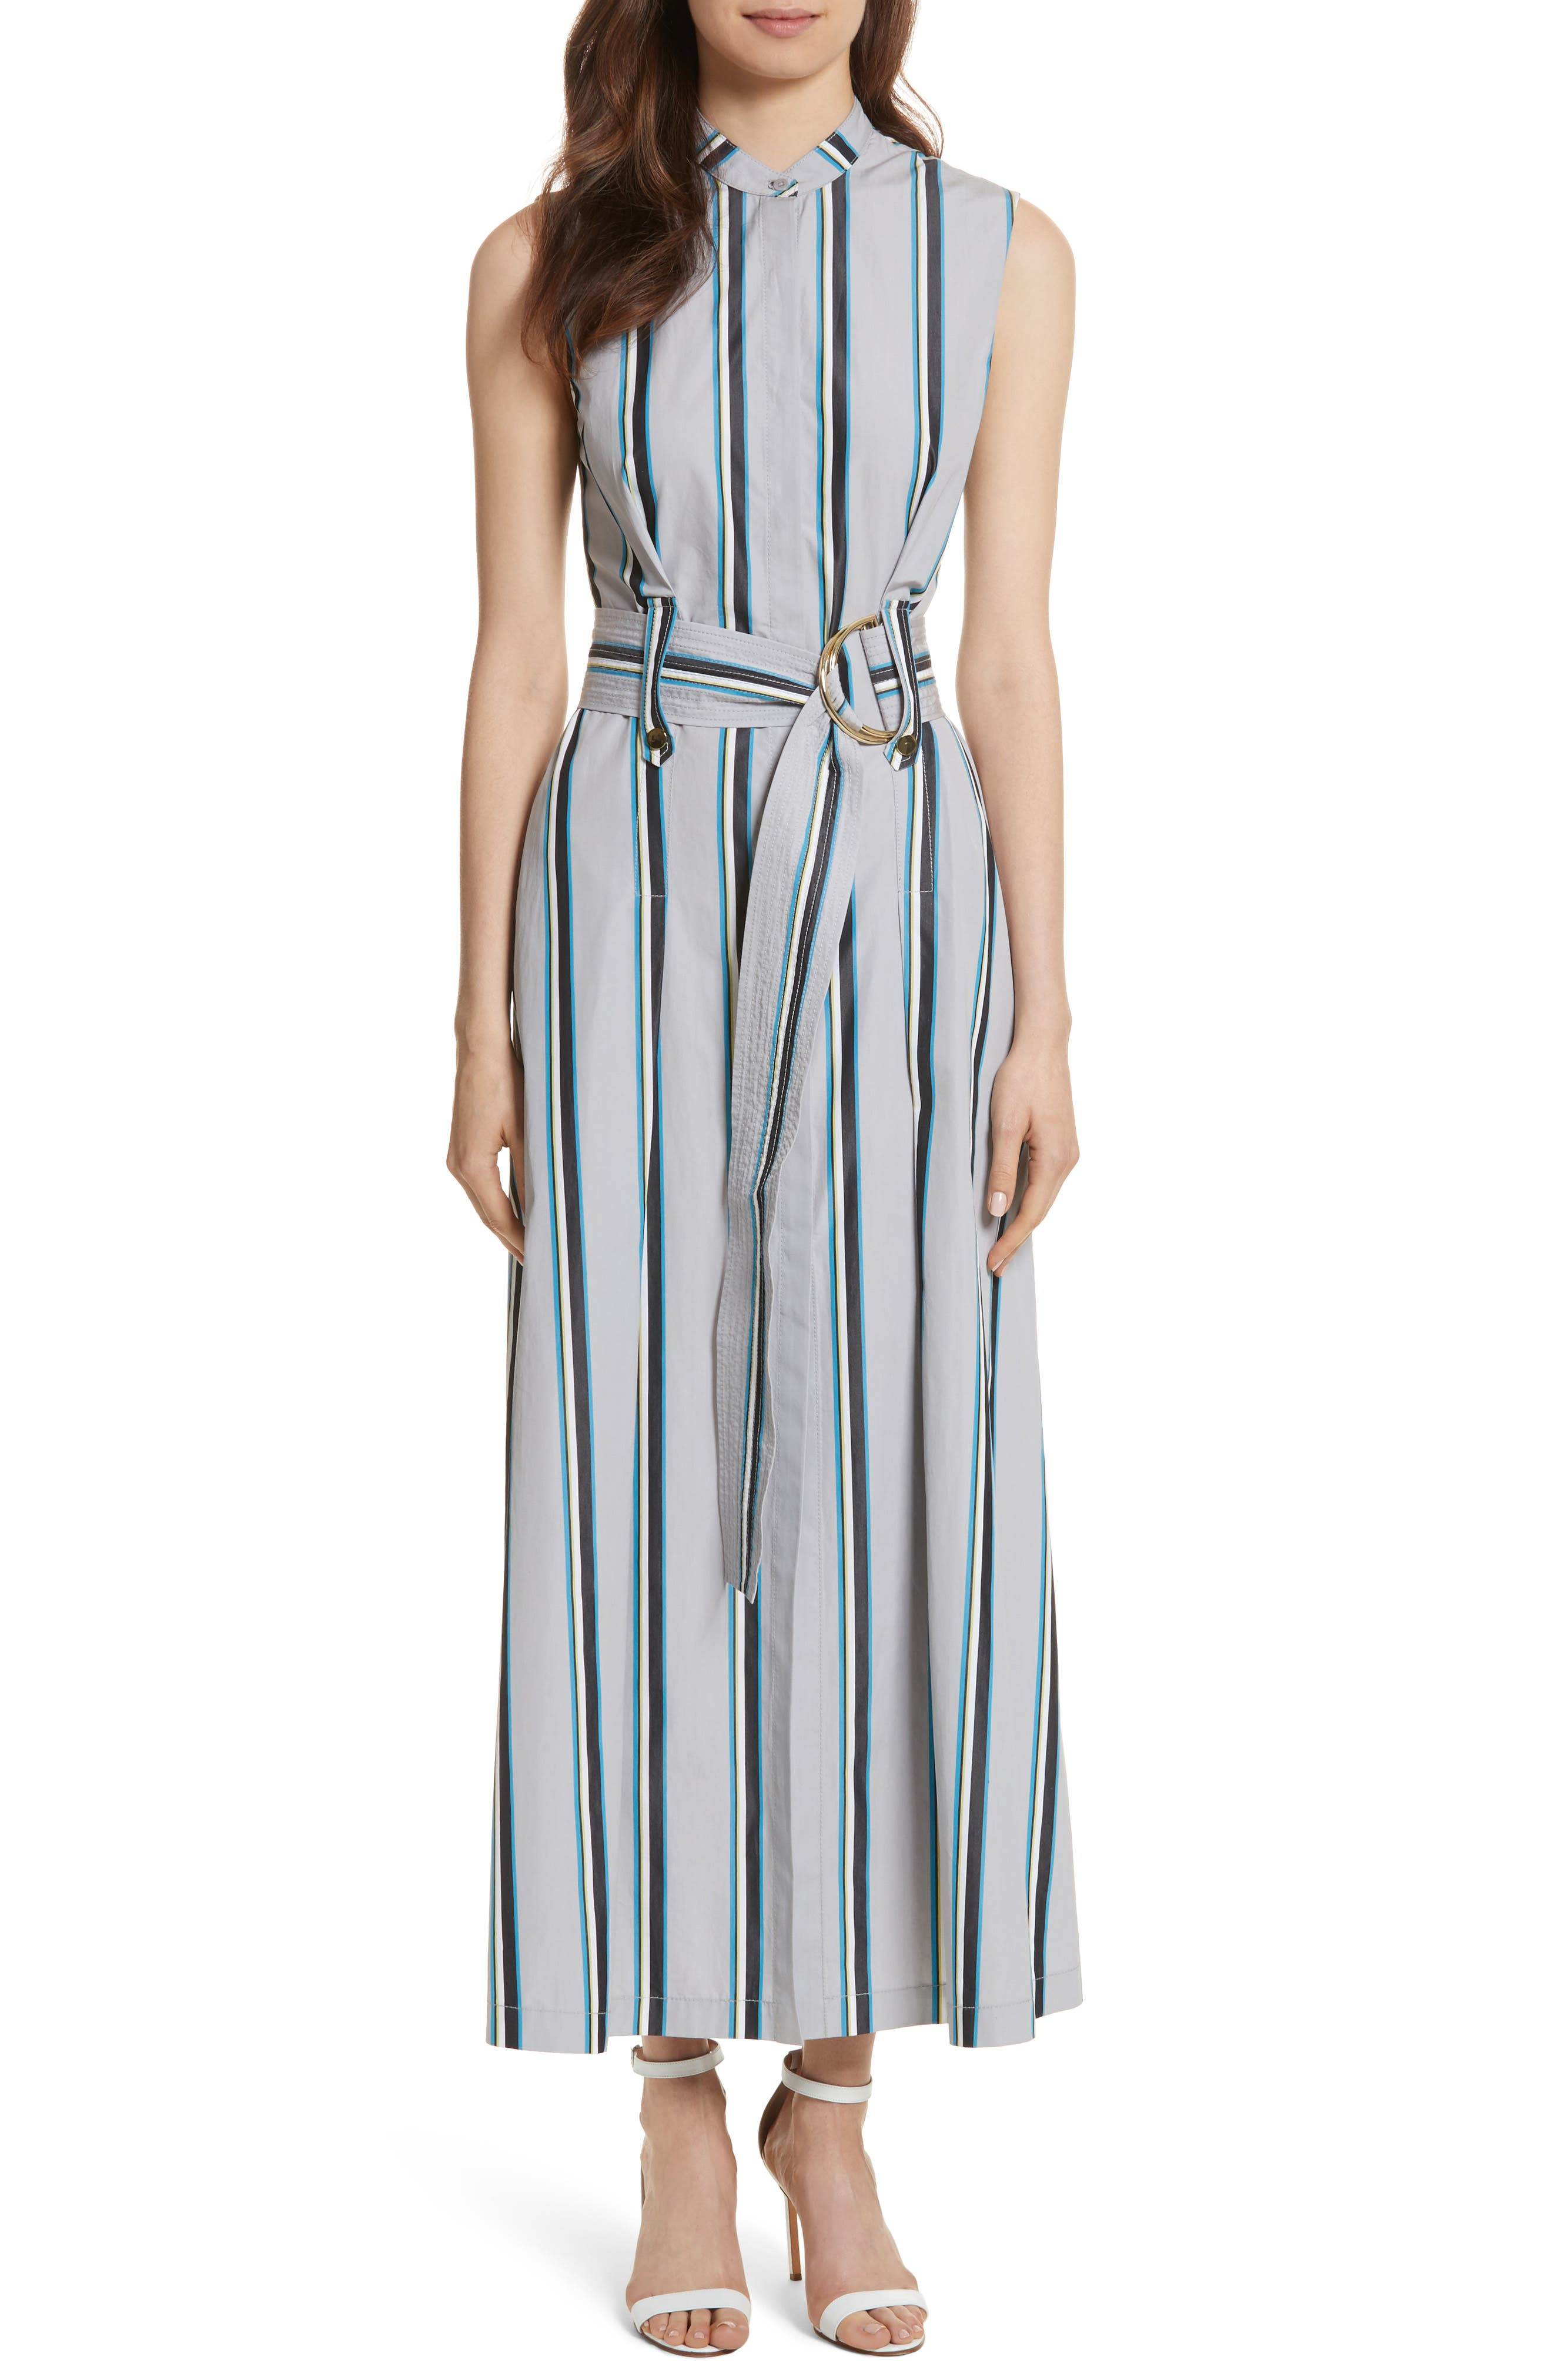 Diane von Furstenberg Stripe Belted Maxi Dress,                         Main,                         color, Smoke Multi